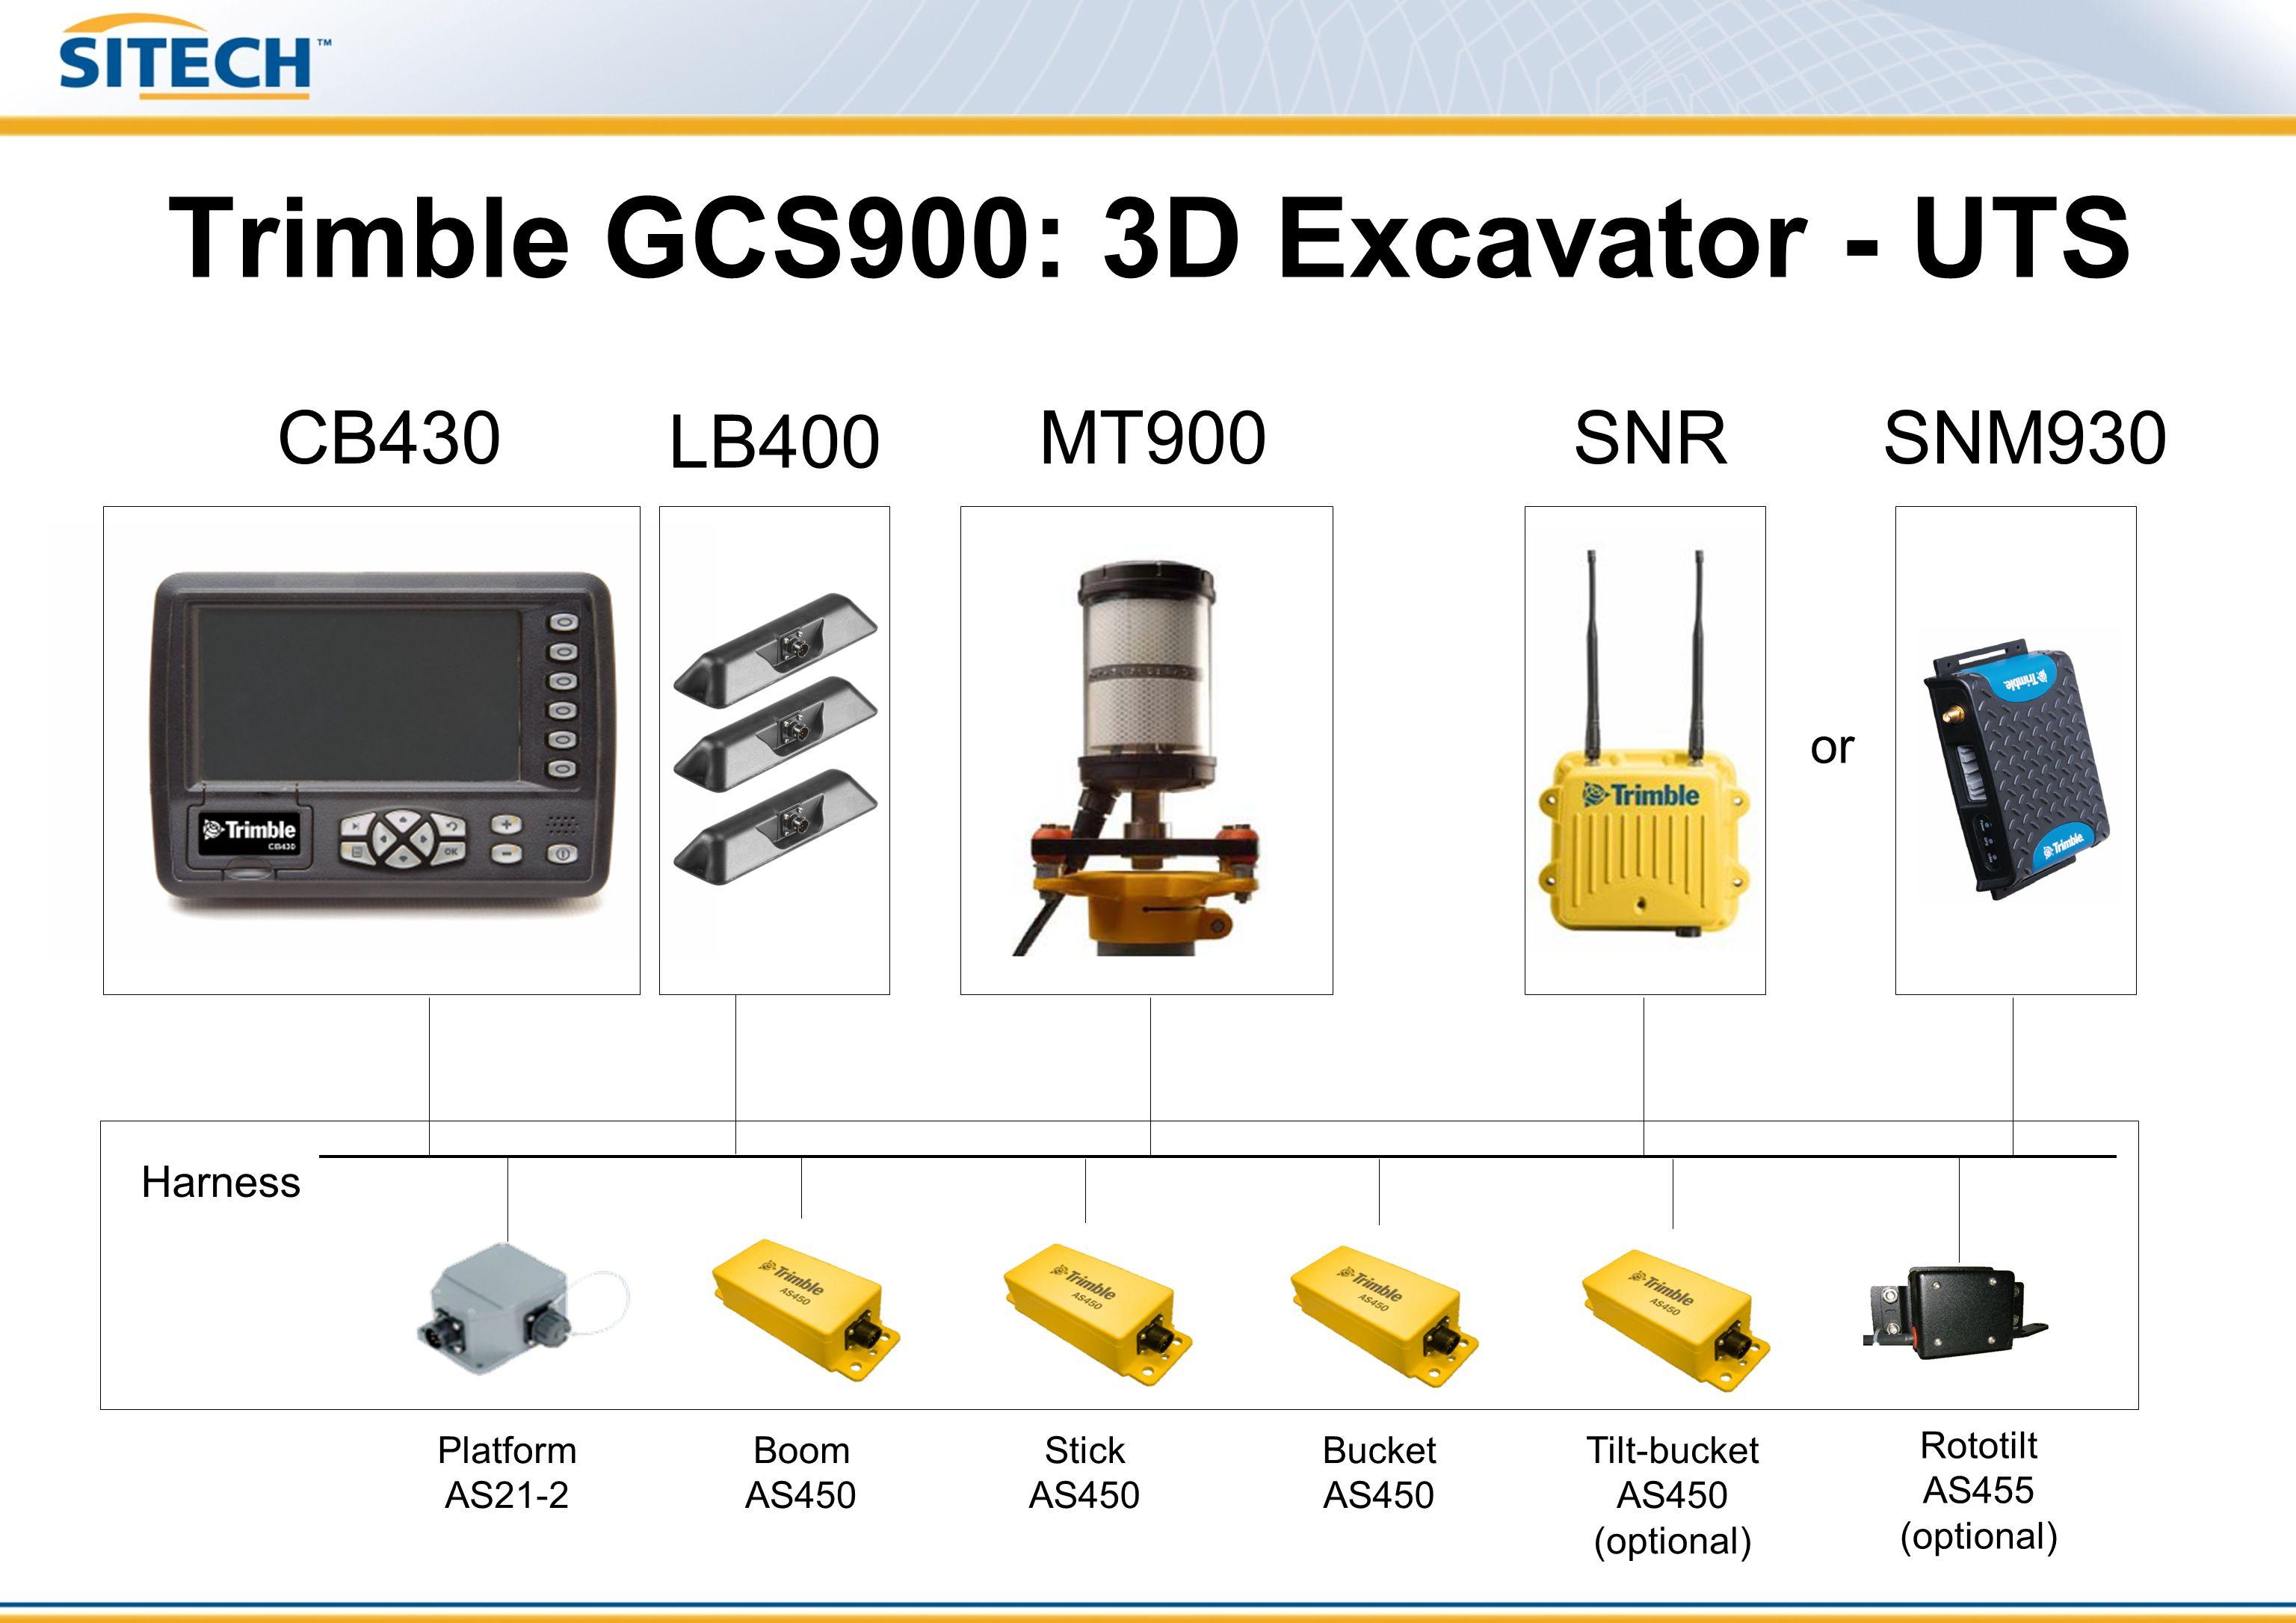 Trimble GCS900: 3D Excavator - UTS